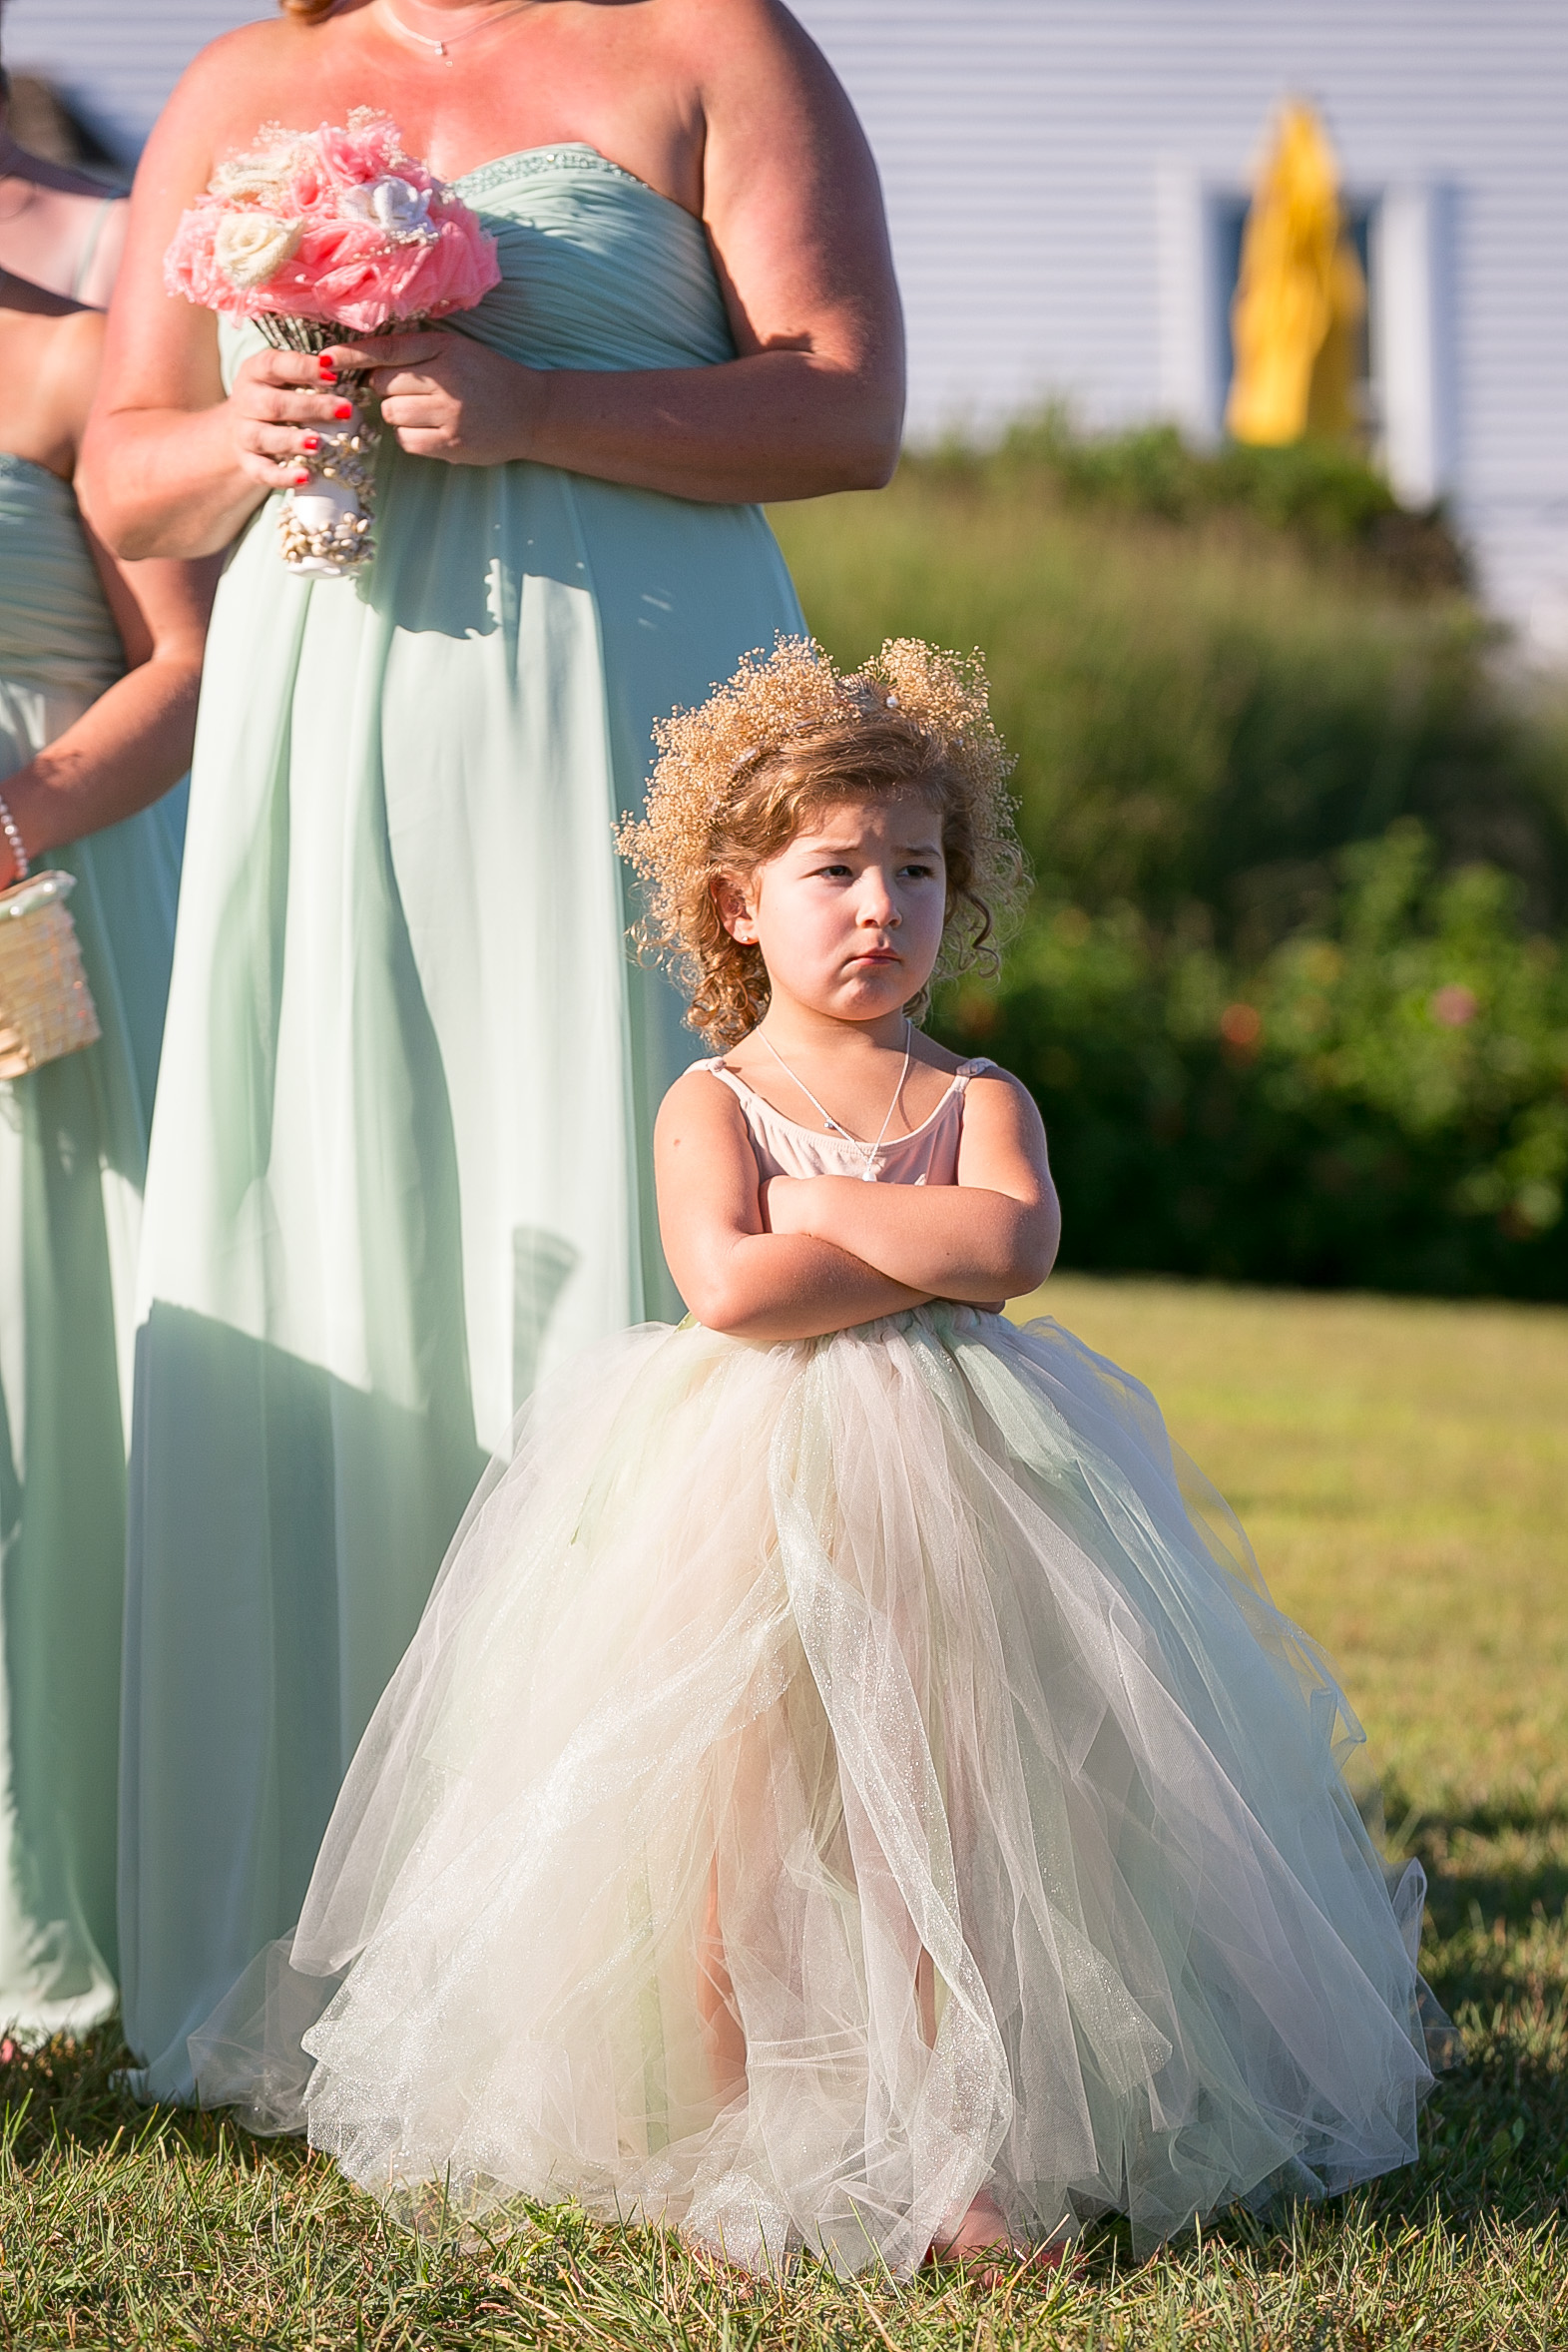 Summer-Wedding-Mystic-Lighthouse-Connecticut-Shore-Jacek-Dolata-Photography-6.jpg